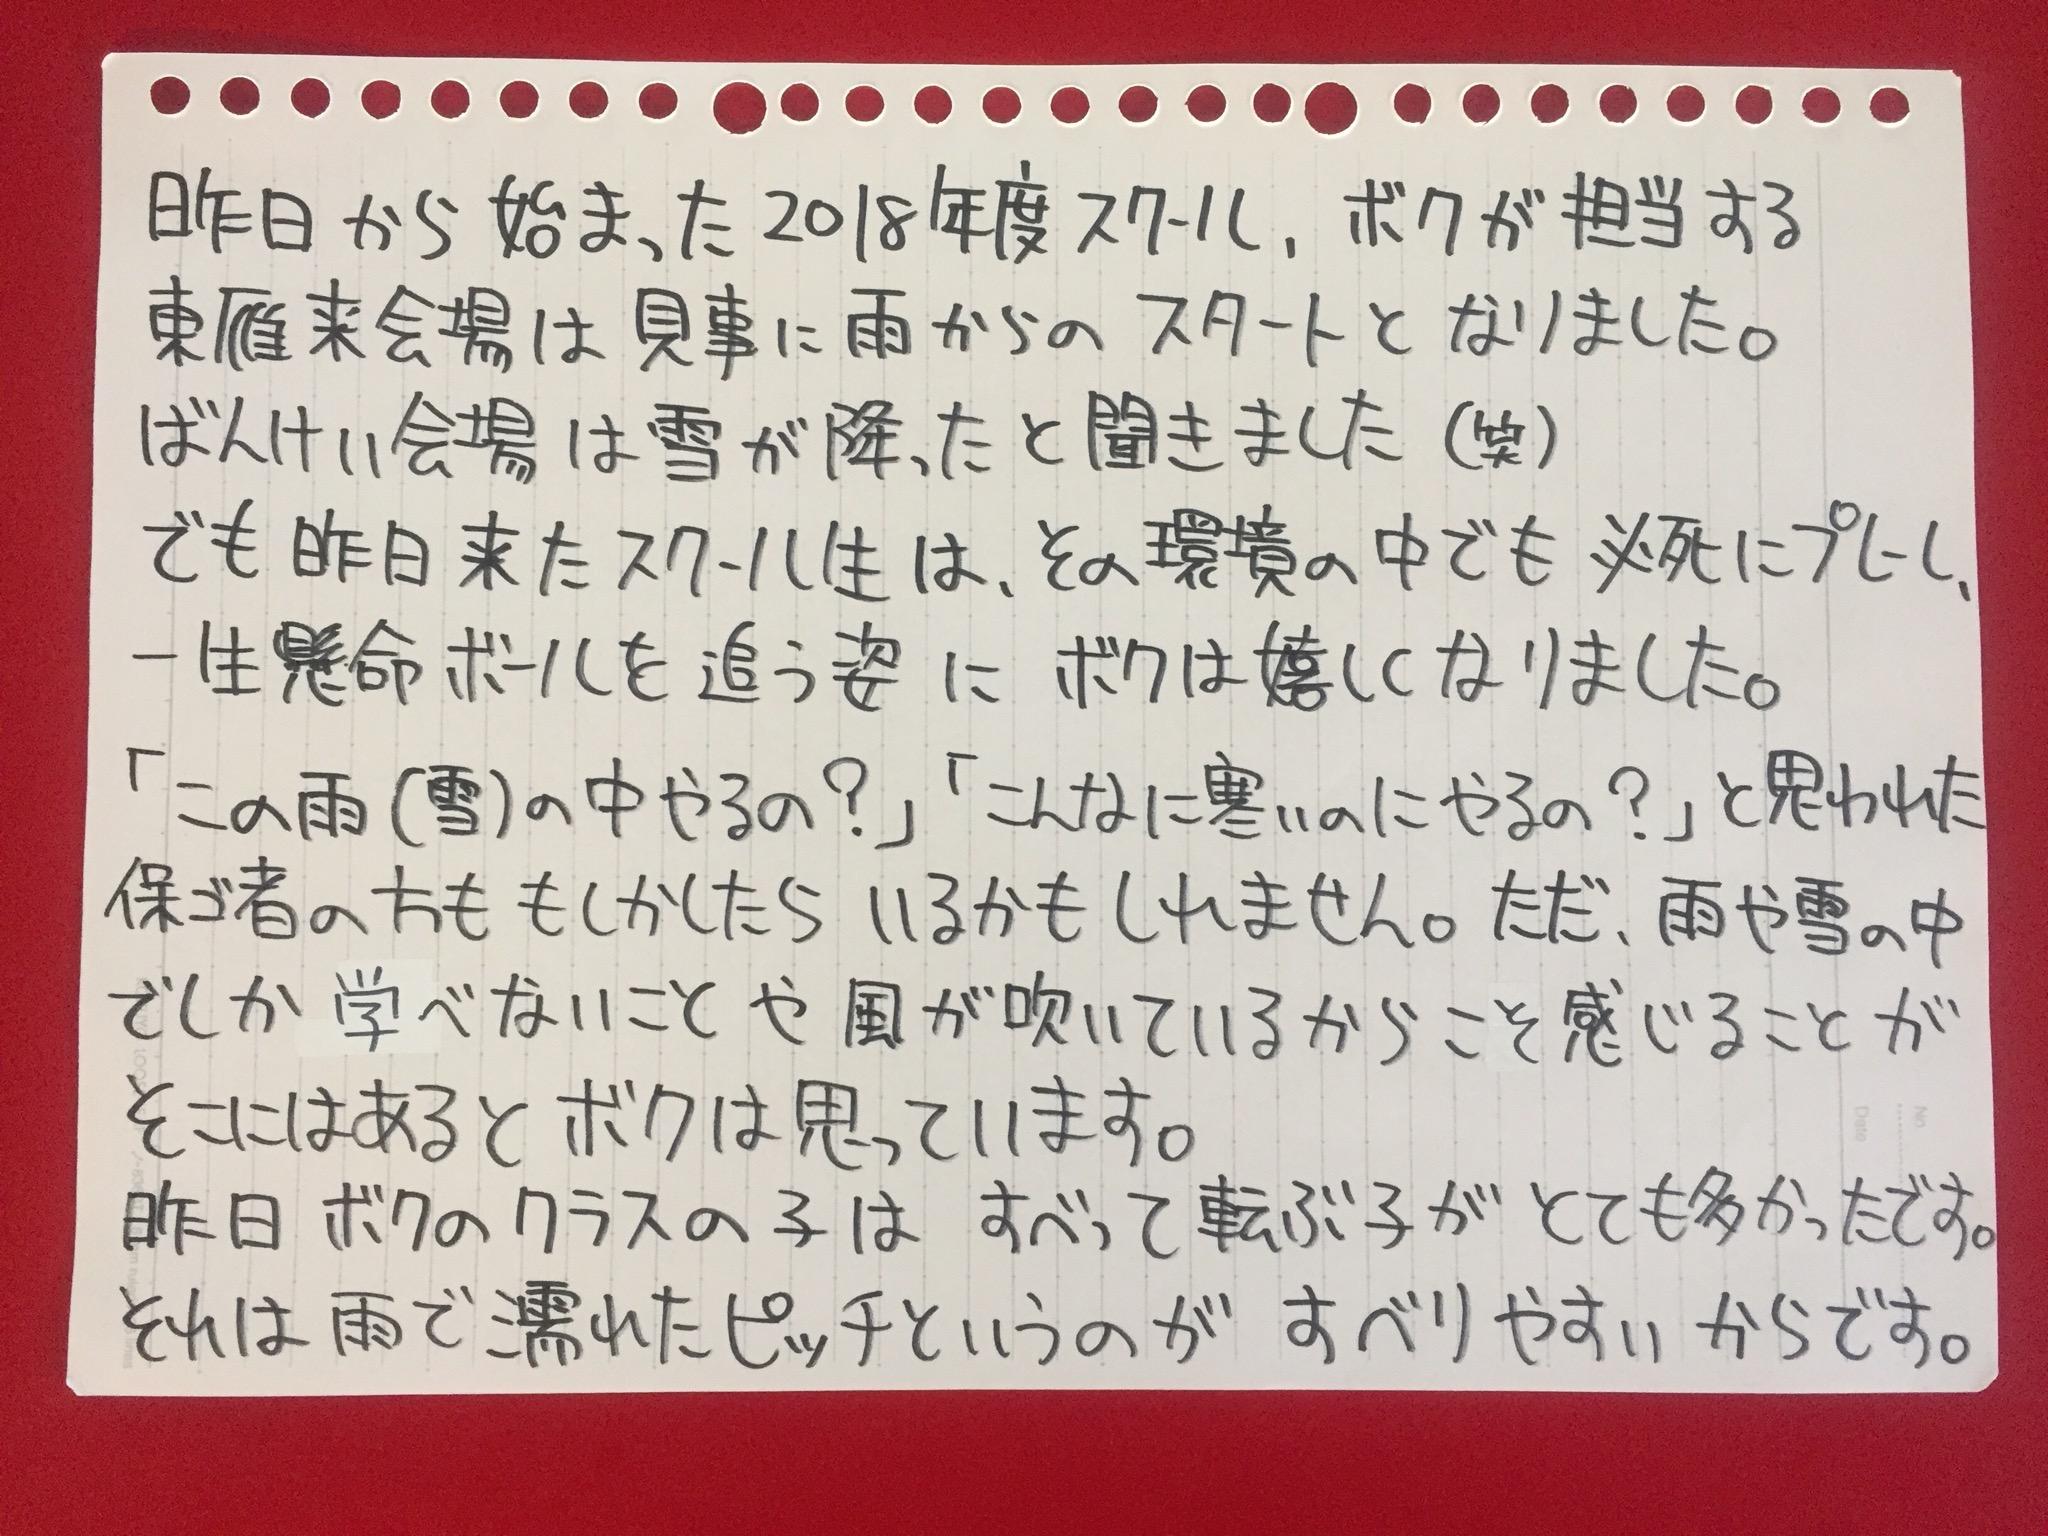 http://chsc.jp/report/up_images/AA7F8742-CBDB-4ACC-A131-87B0D3C212D6.jpeg